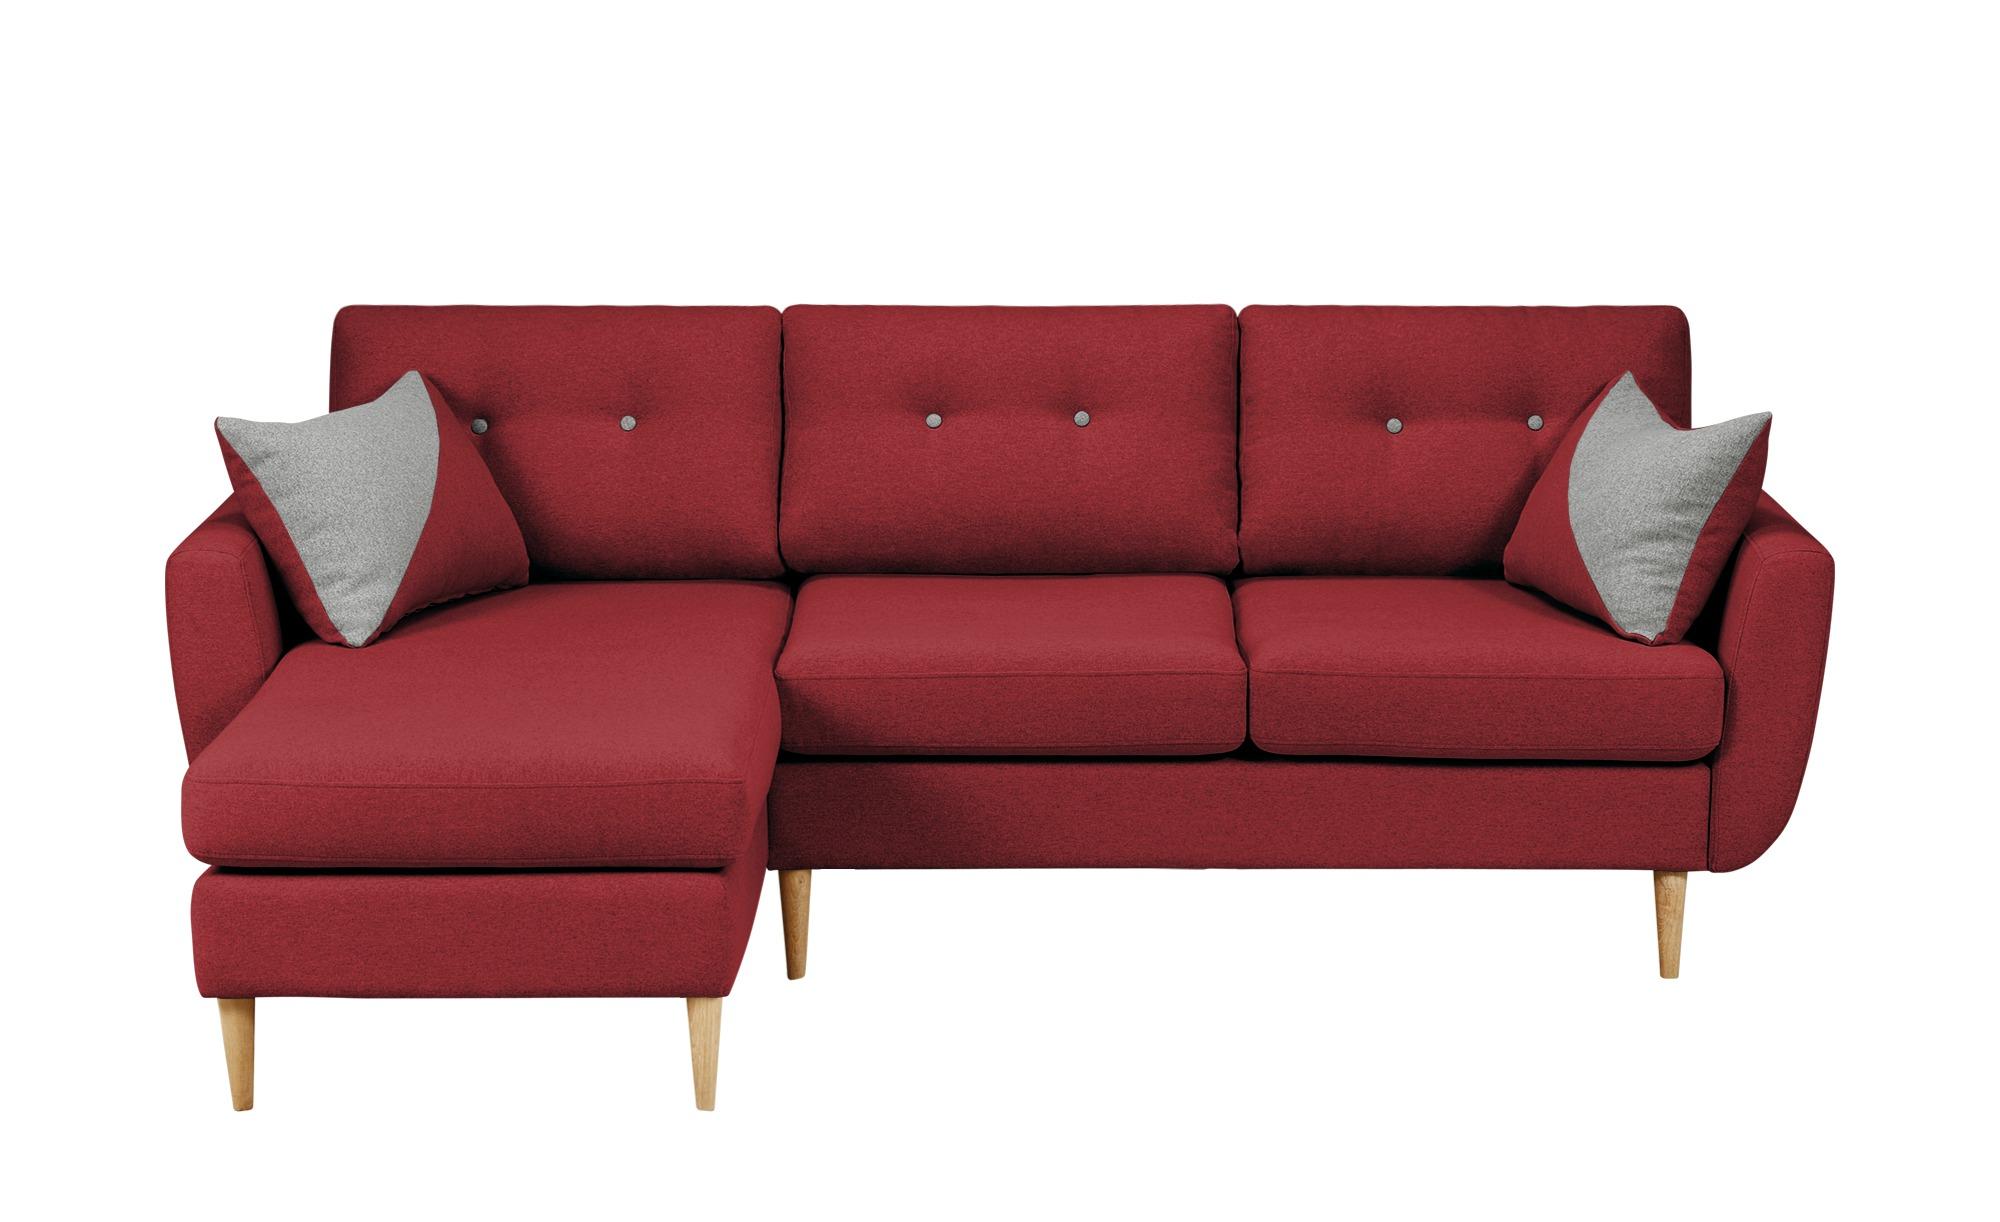 Finya ecksofa harris breite h he 85 cm rot online kaufen for Ecksofa breite 200 cm